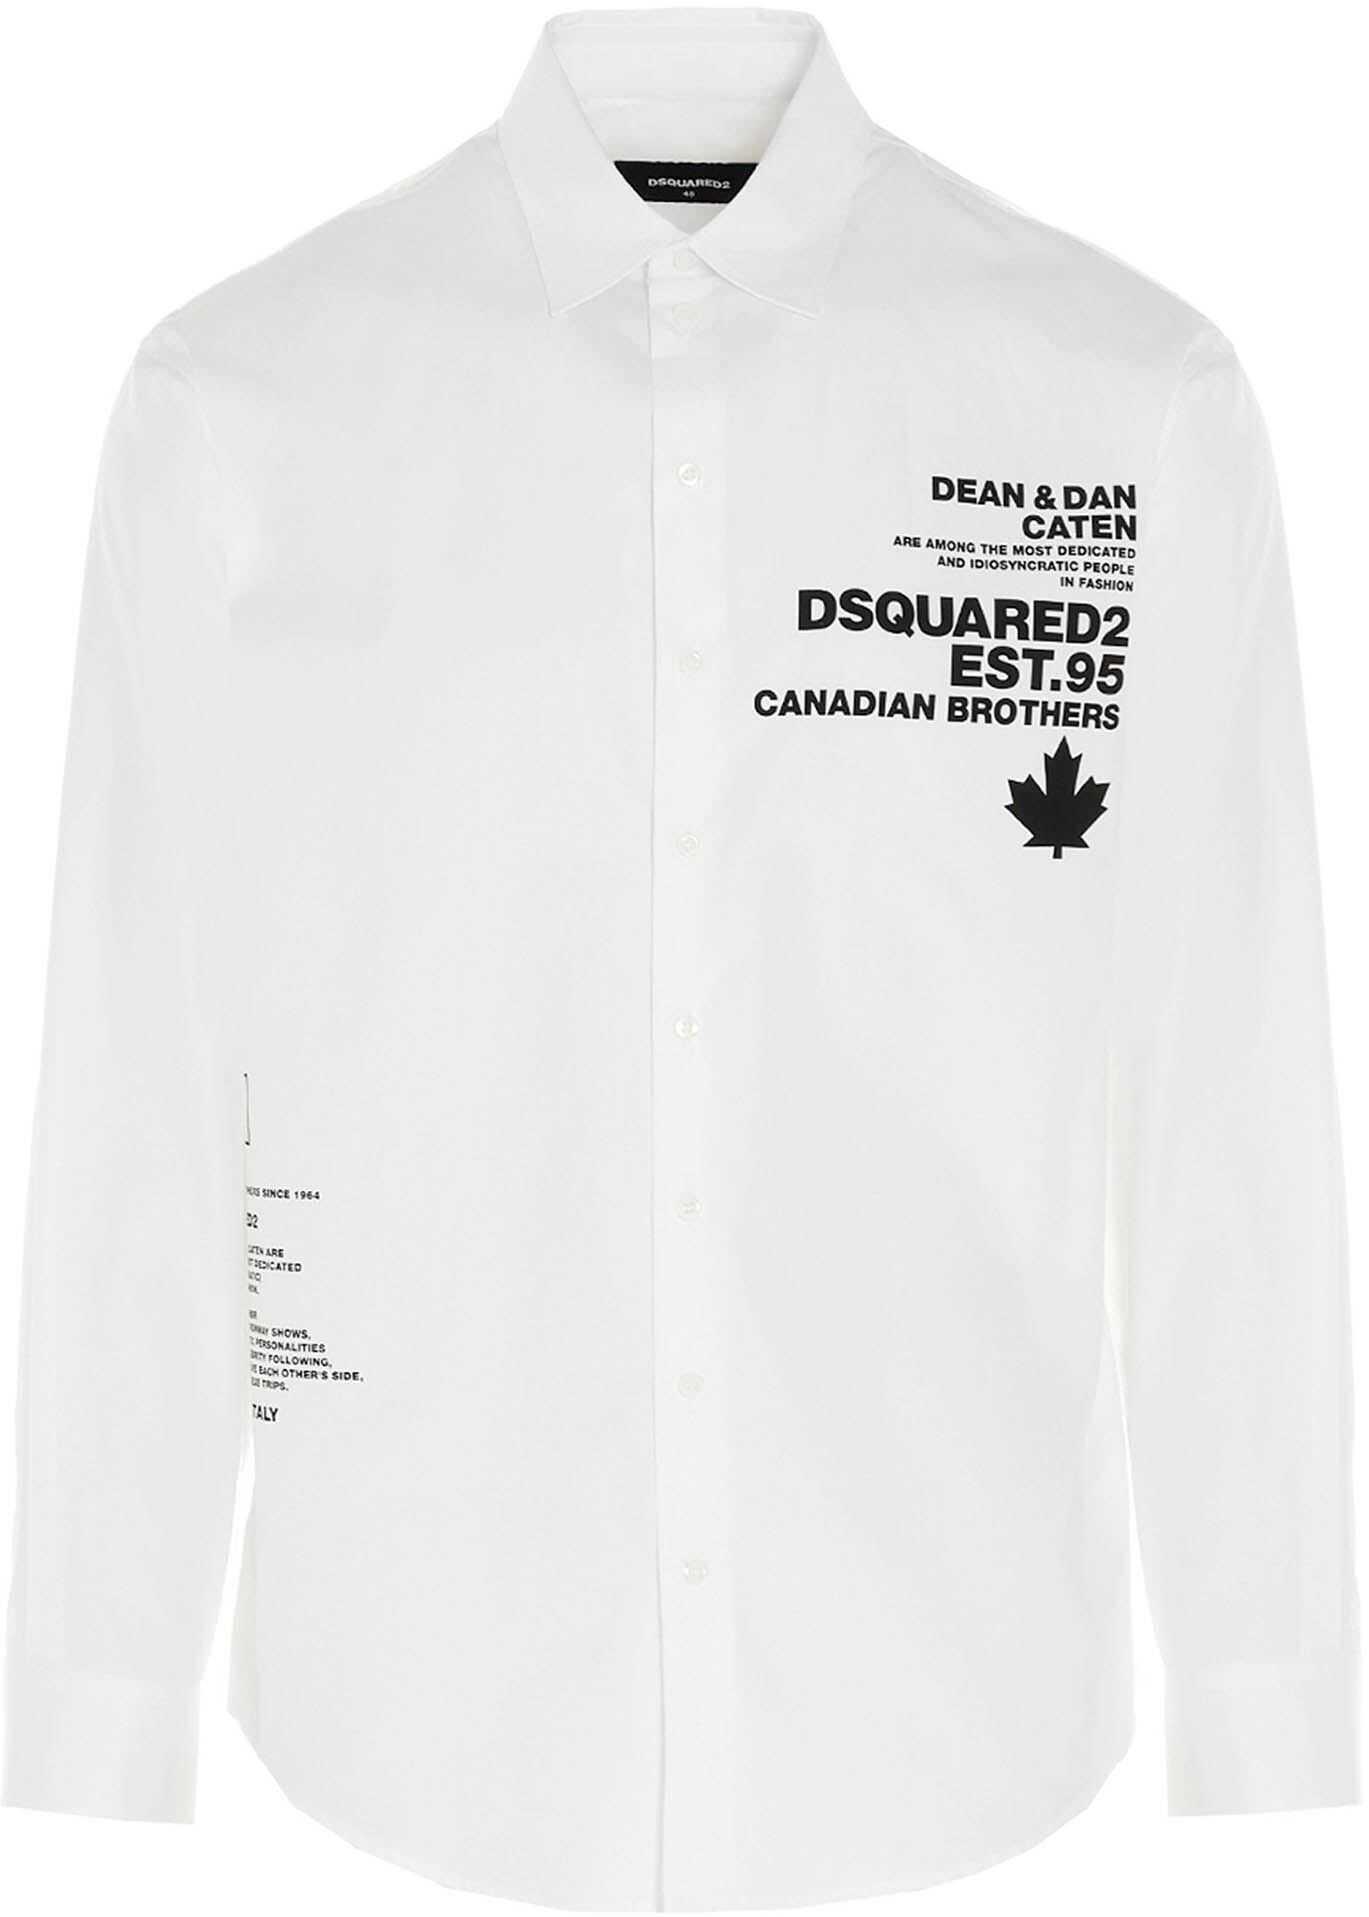 DSQUARED2 Est. 95 Shirt In White White imagine